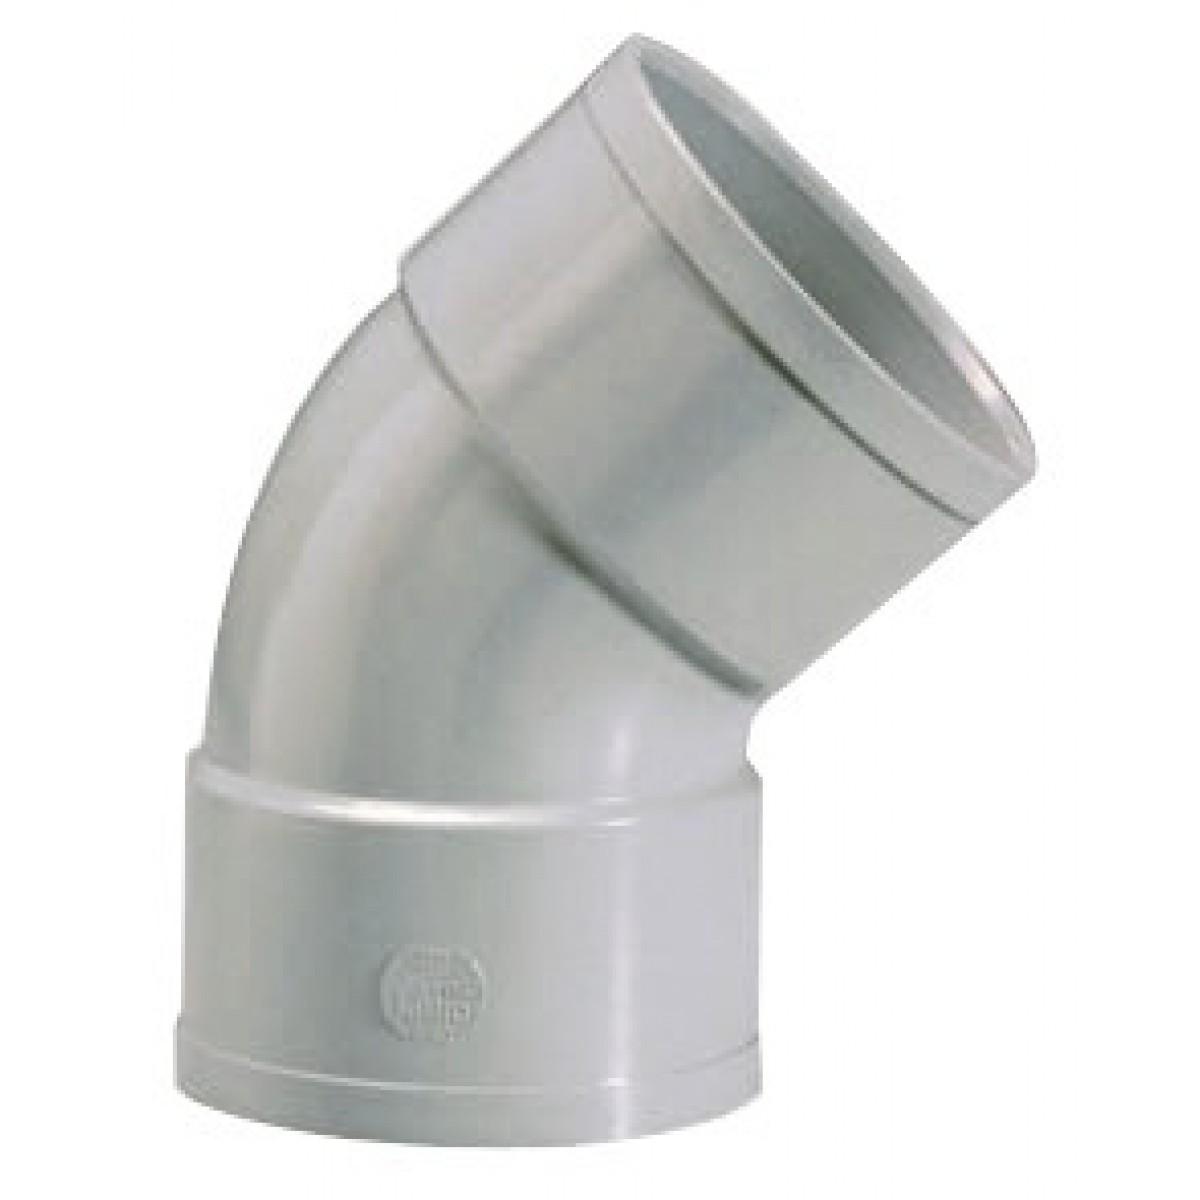 Coude à 45° Femelle / Femelle Girpi - Diamètre 50 mm